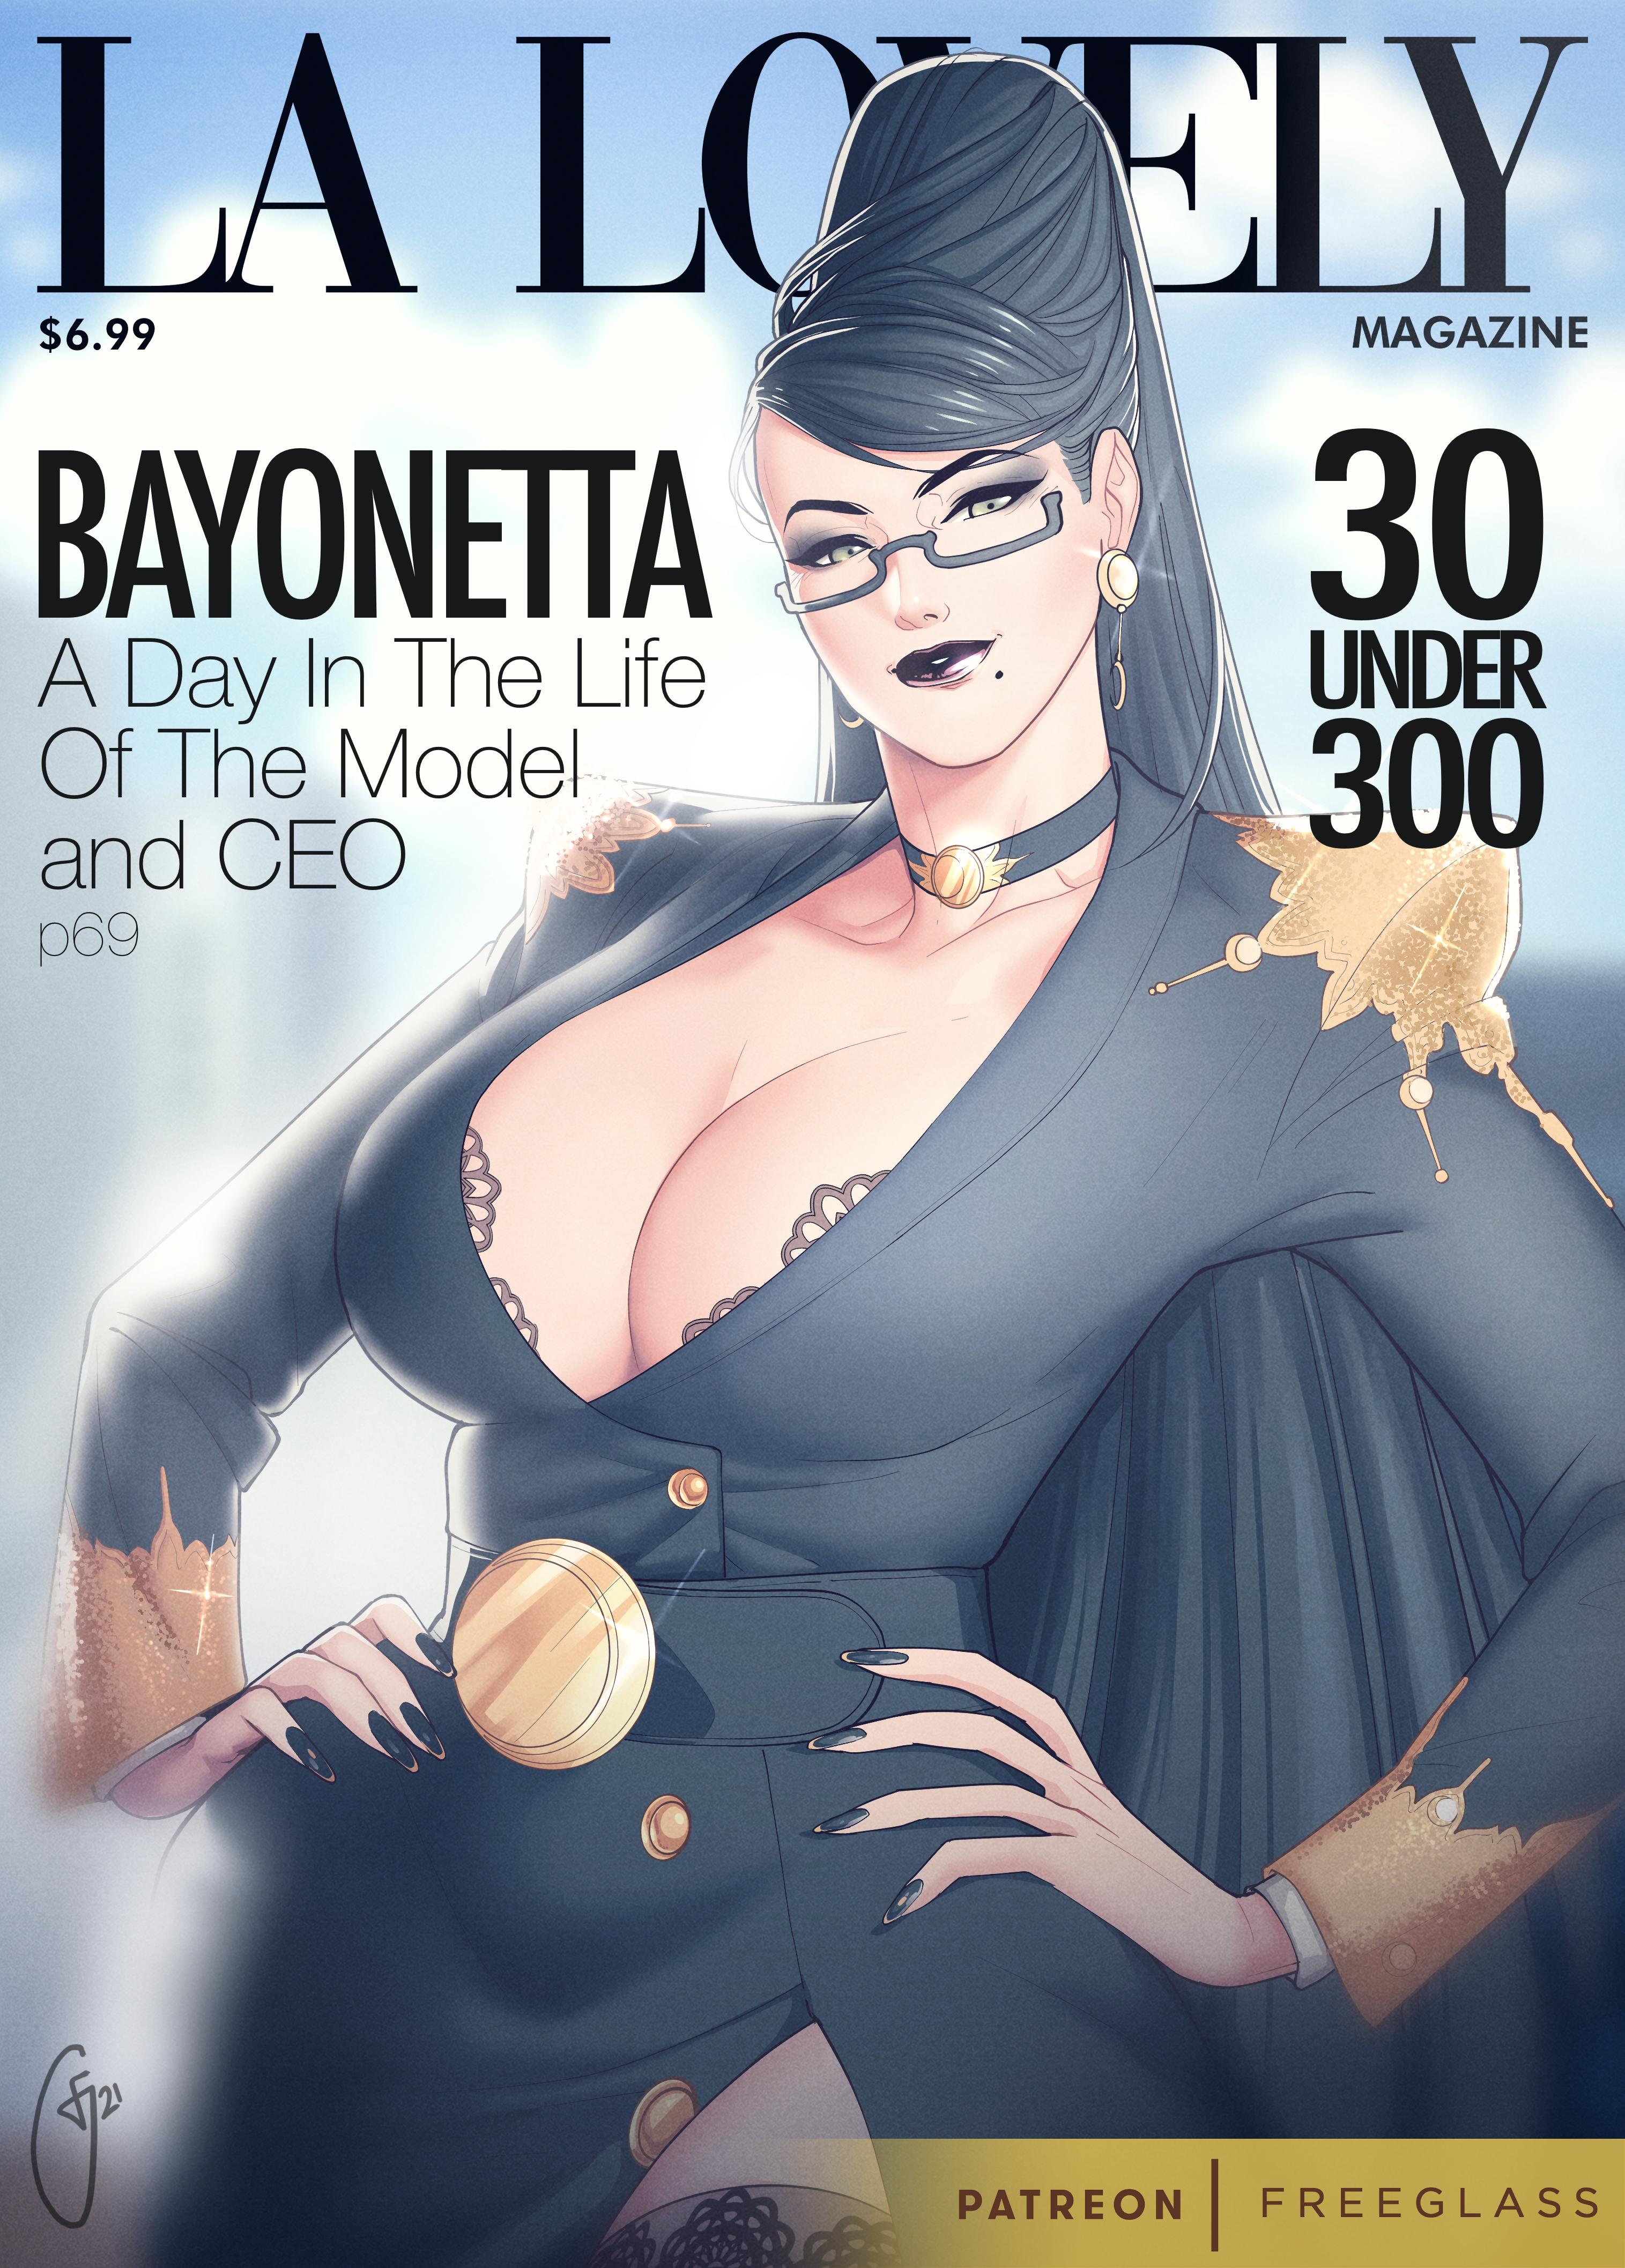 Bayonetta - Covergirl